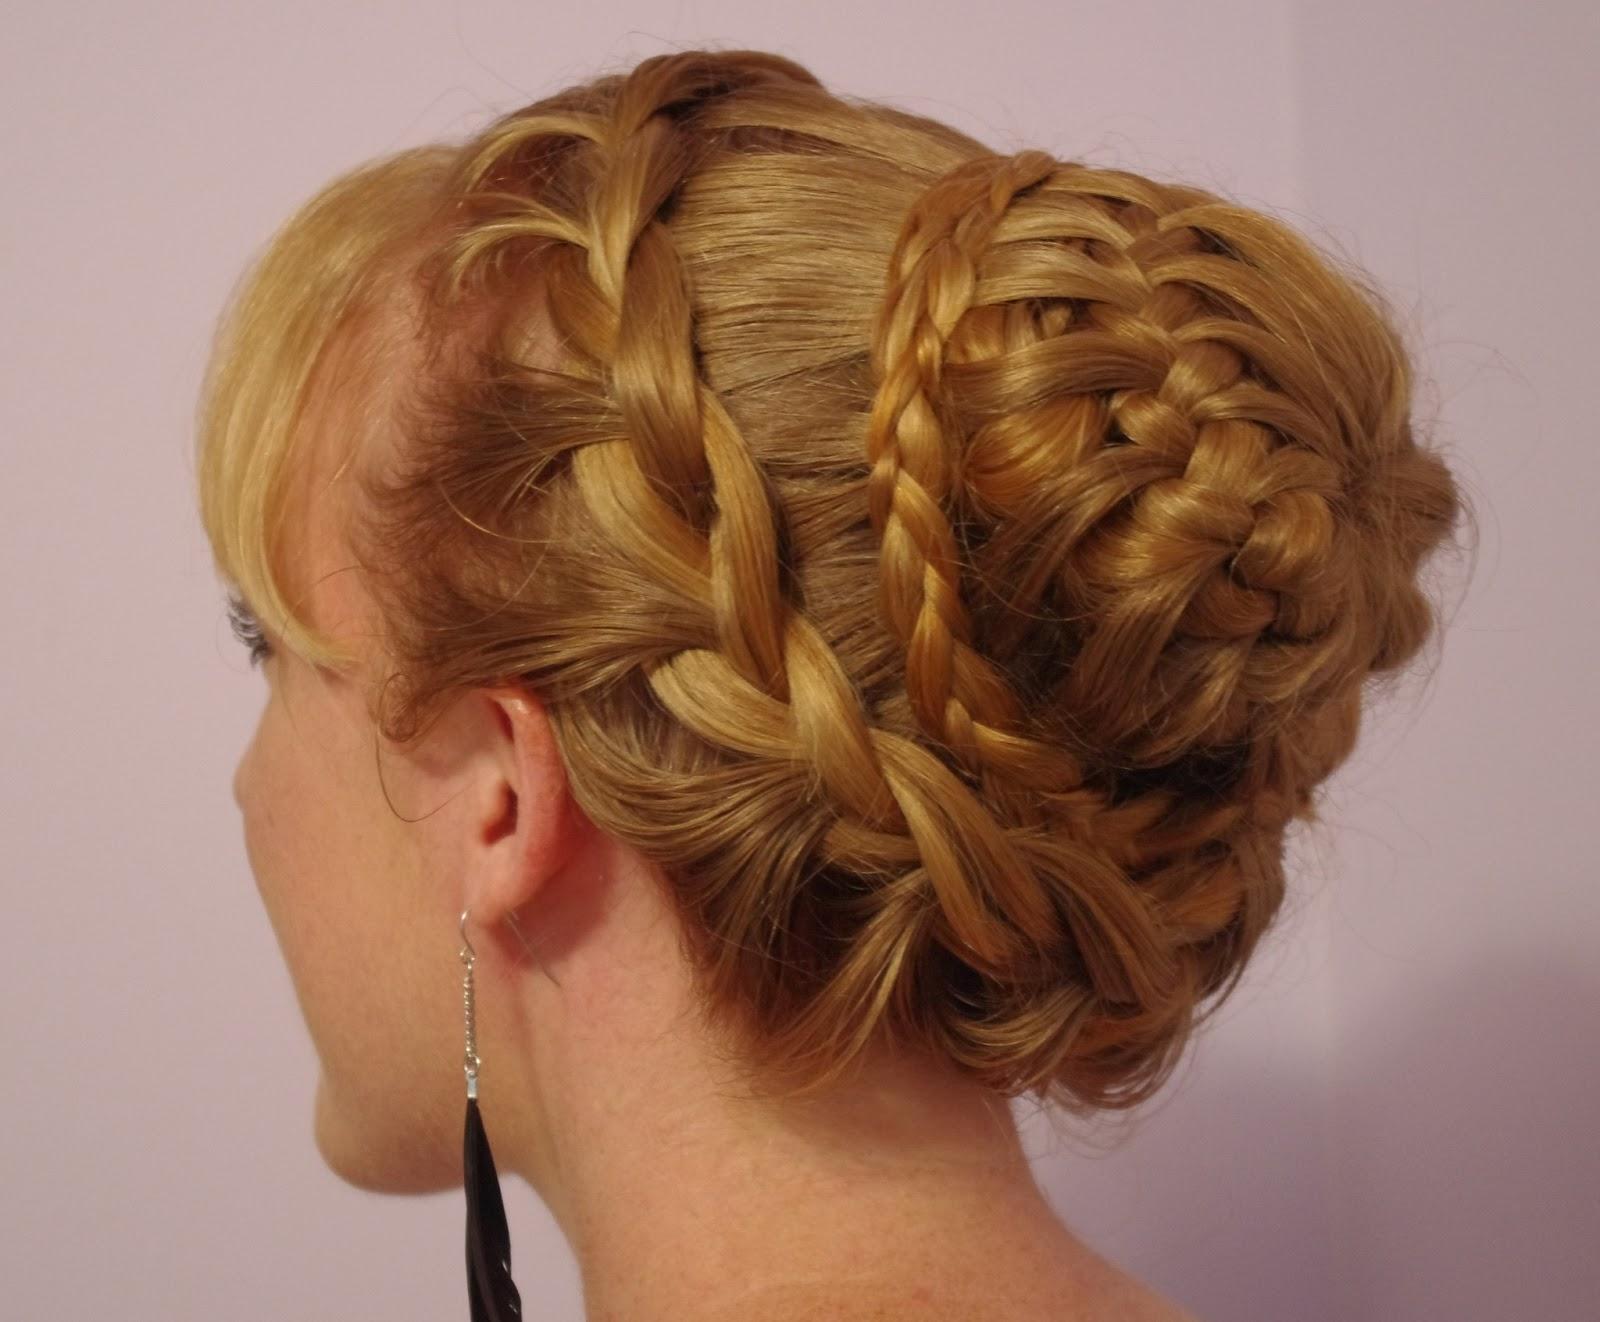 Braided Bun Hairstyles For Long Hair | notonlybeauty